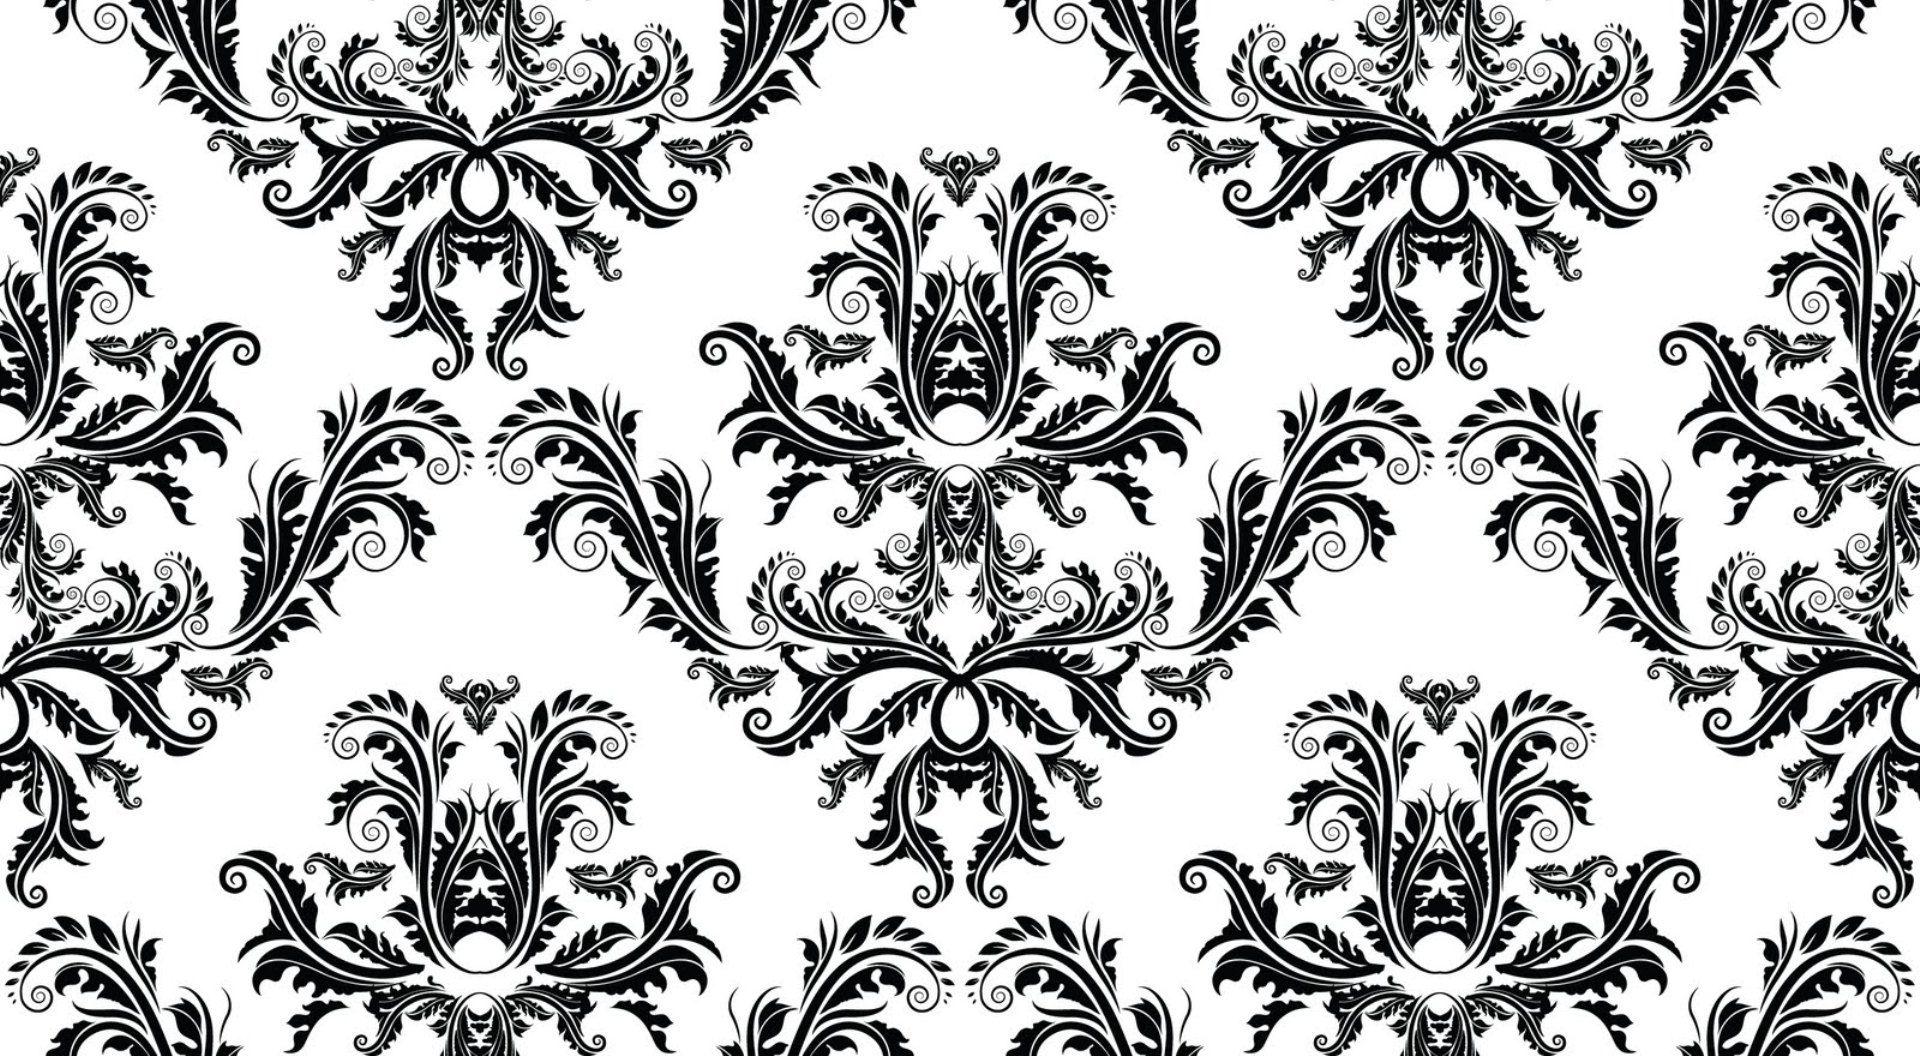 Black and White Vintage Damask Pattern Wallpaper Free